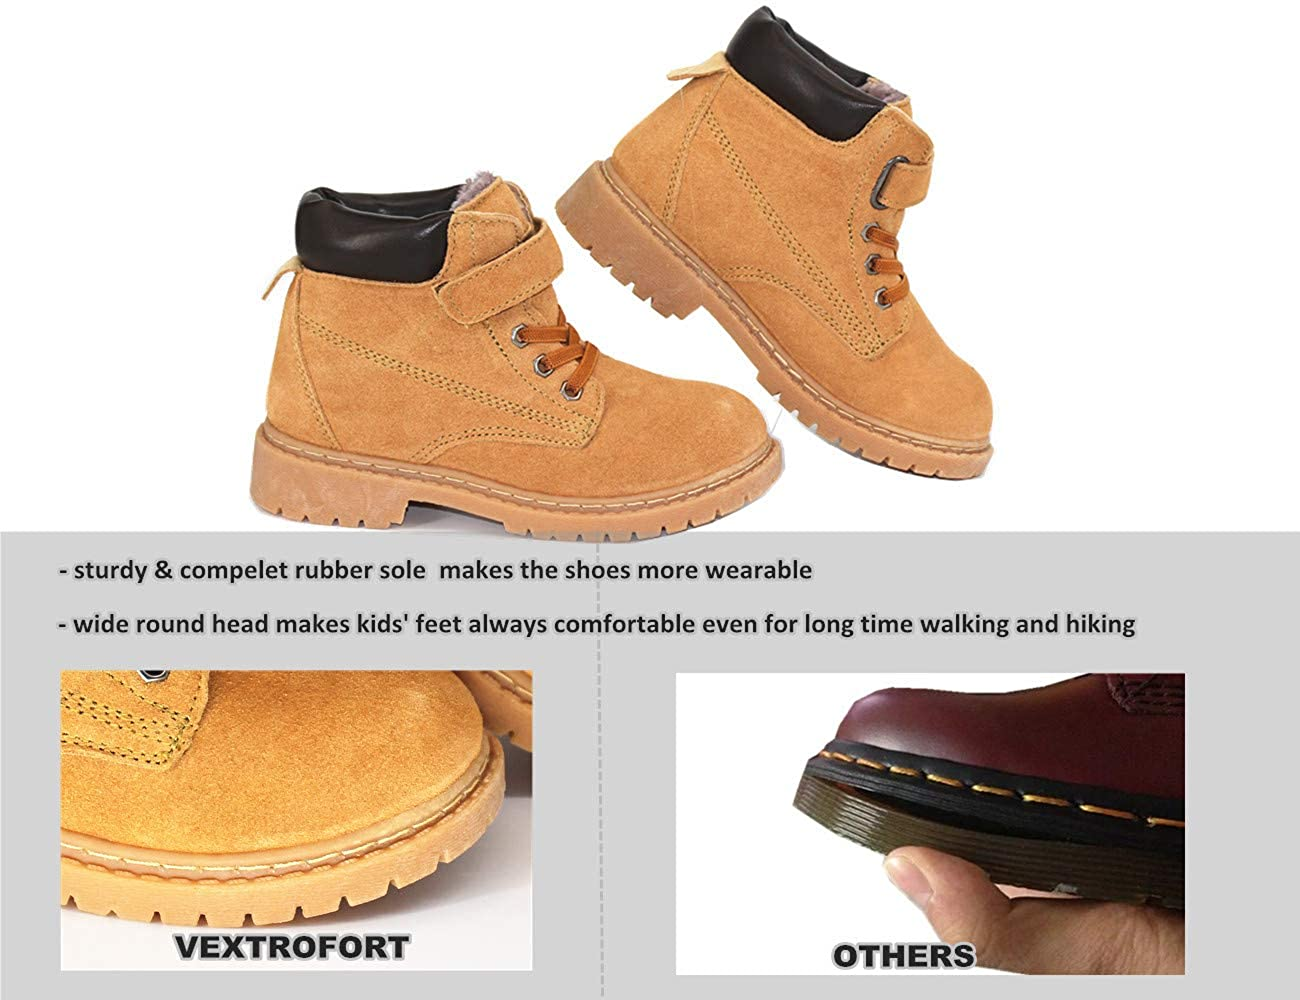 Khaki//Black Winter Outdoor Waterproof Hiking Leather Boot for Boys Girls Vextrofort Kids Boots Little Kids//Big Kids